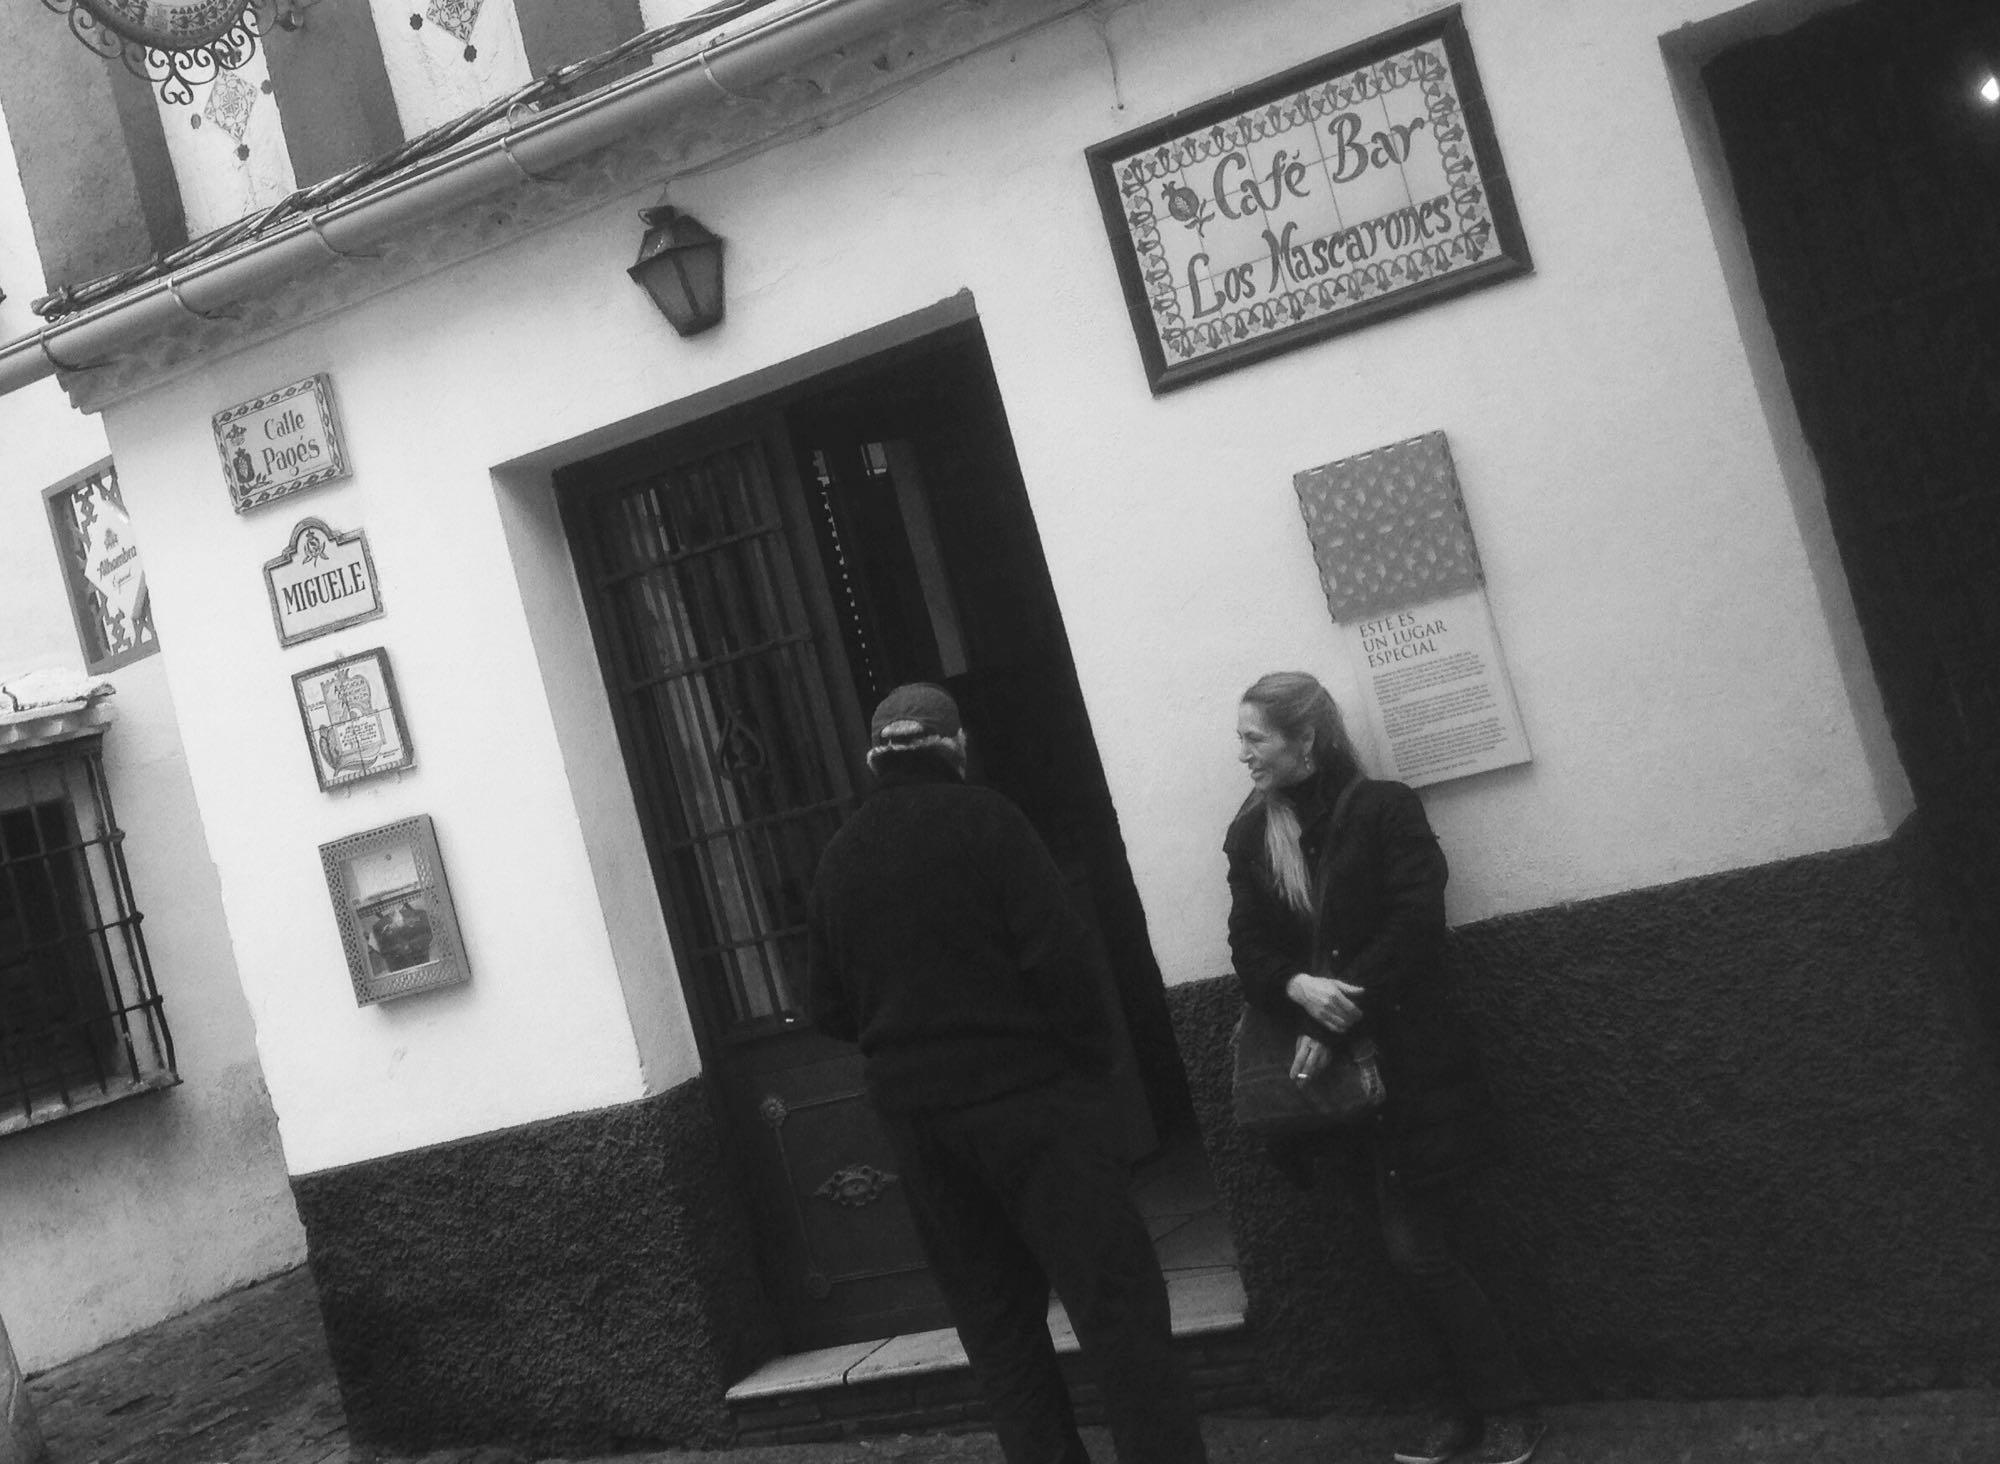 Cafe Bar Los Mascarones im Stadtviertel Albacin